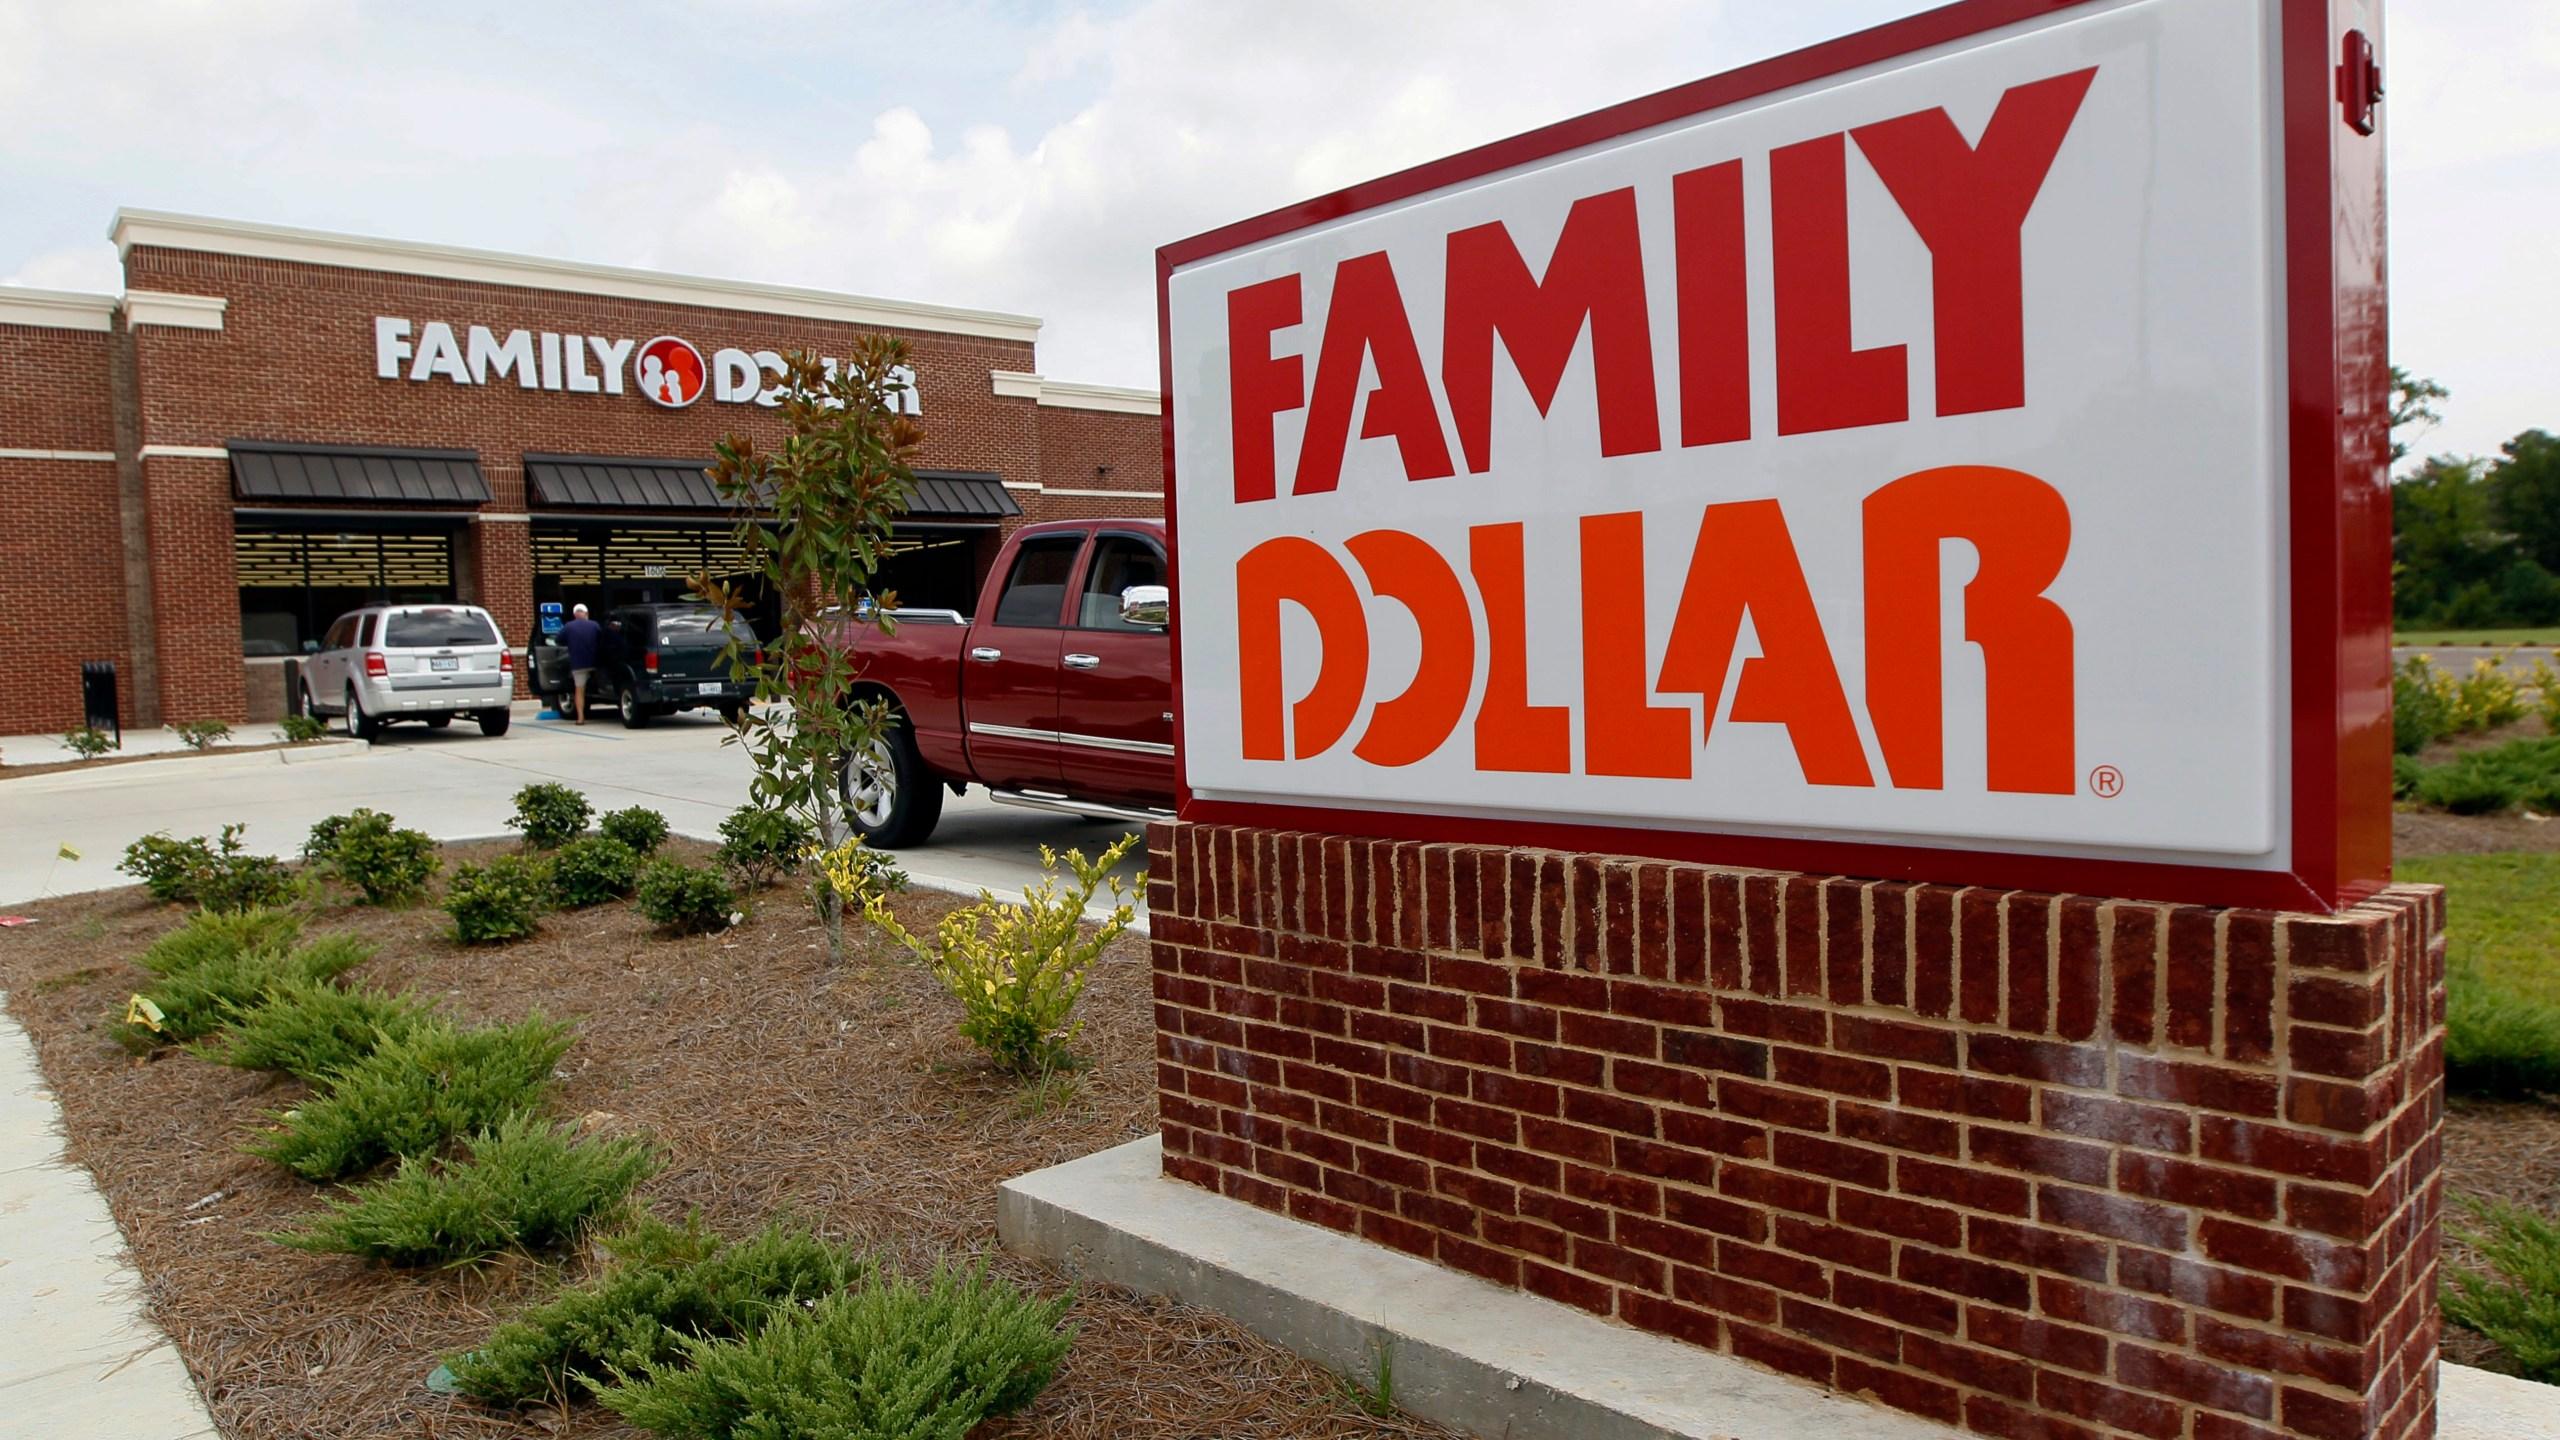 Family_Dollar_Dollar_General_74789-159532.jpg52202471